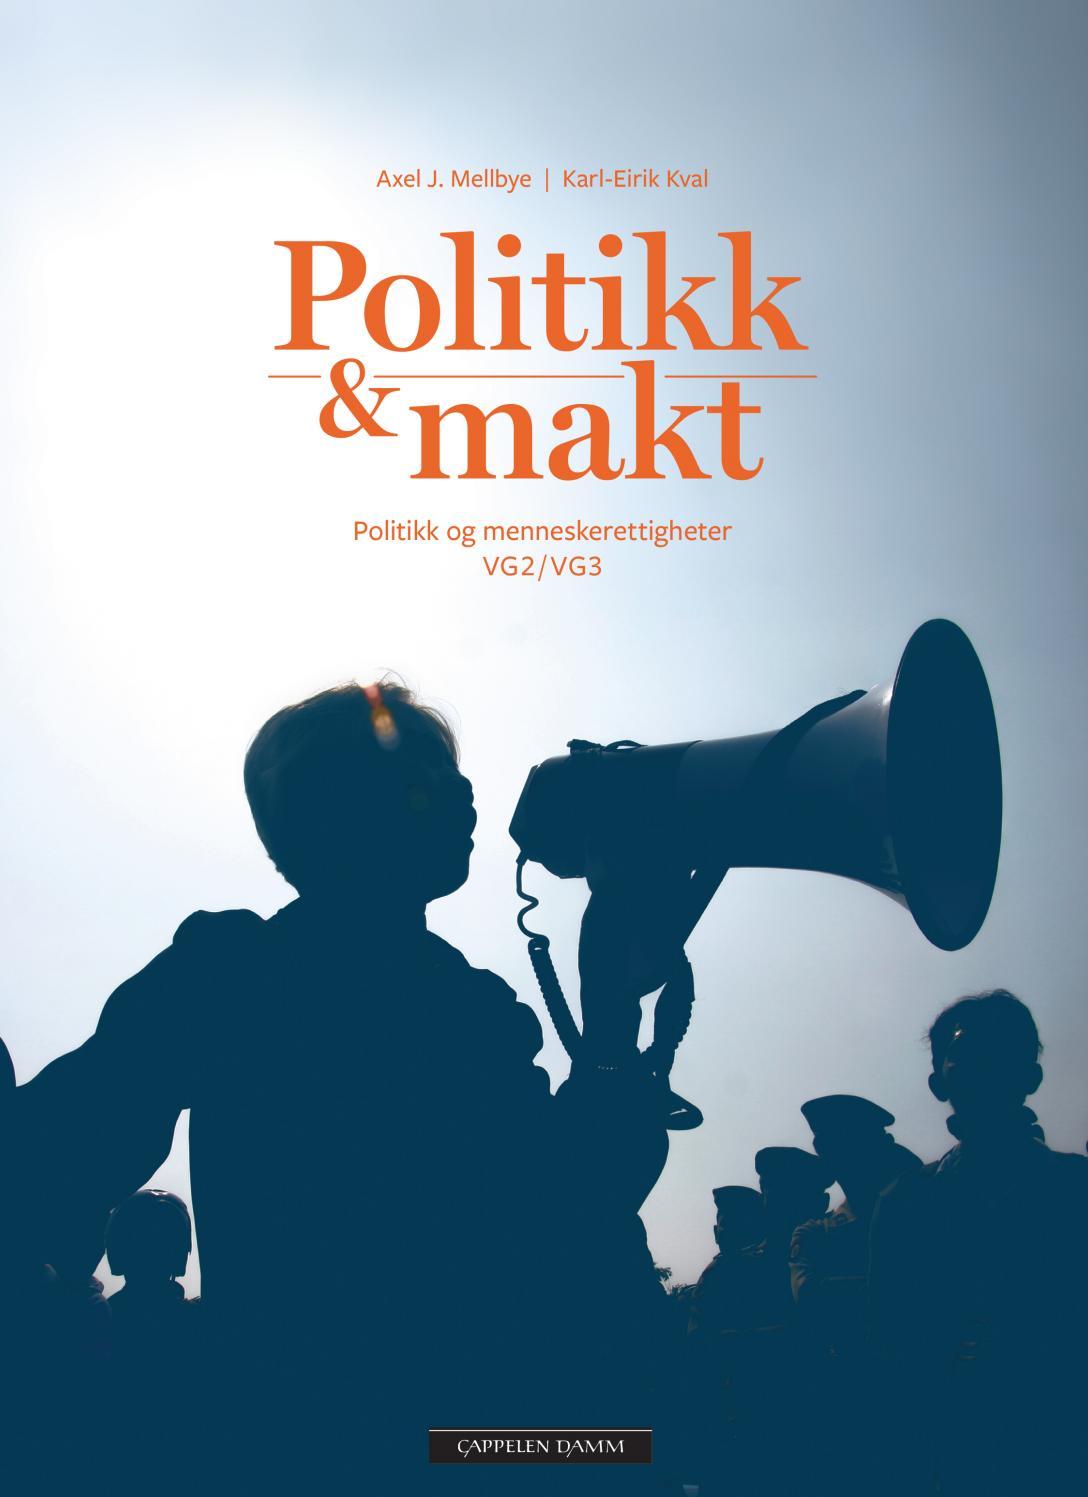 sports shoes ee051 b351a Politikk og makt 2018 blaiboka by Cappelen Damm - issuu